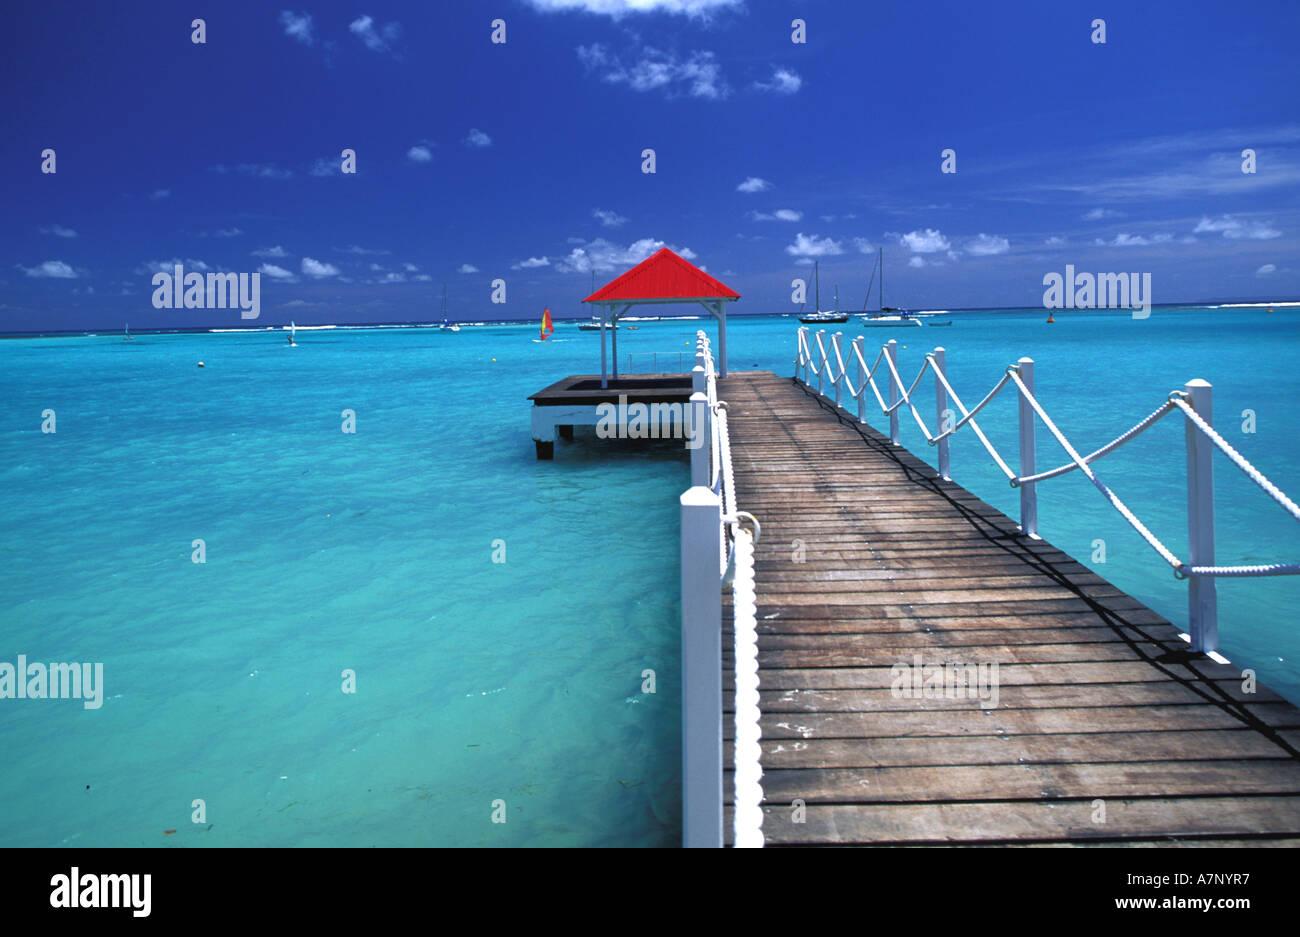 France, Guadeloupe, Grande-Terre, pontoon of Meridien hotel in Saint-Francois - Stock Image